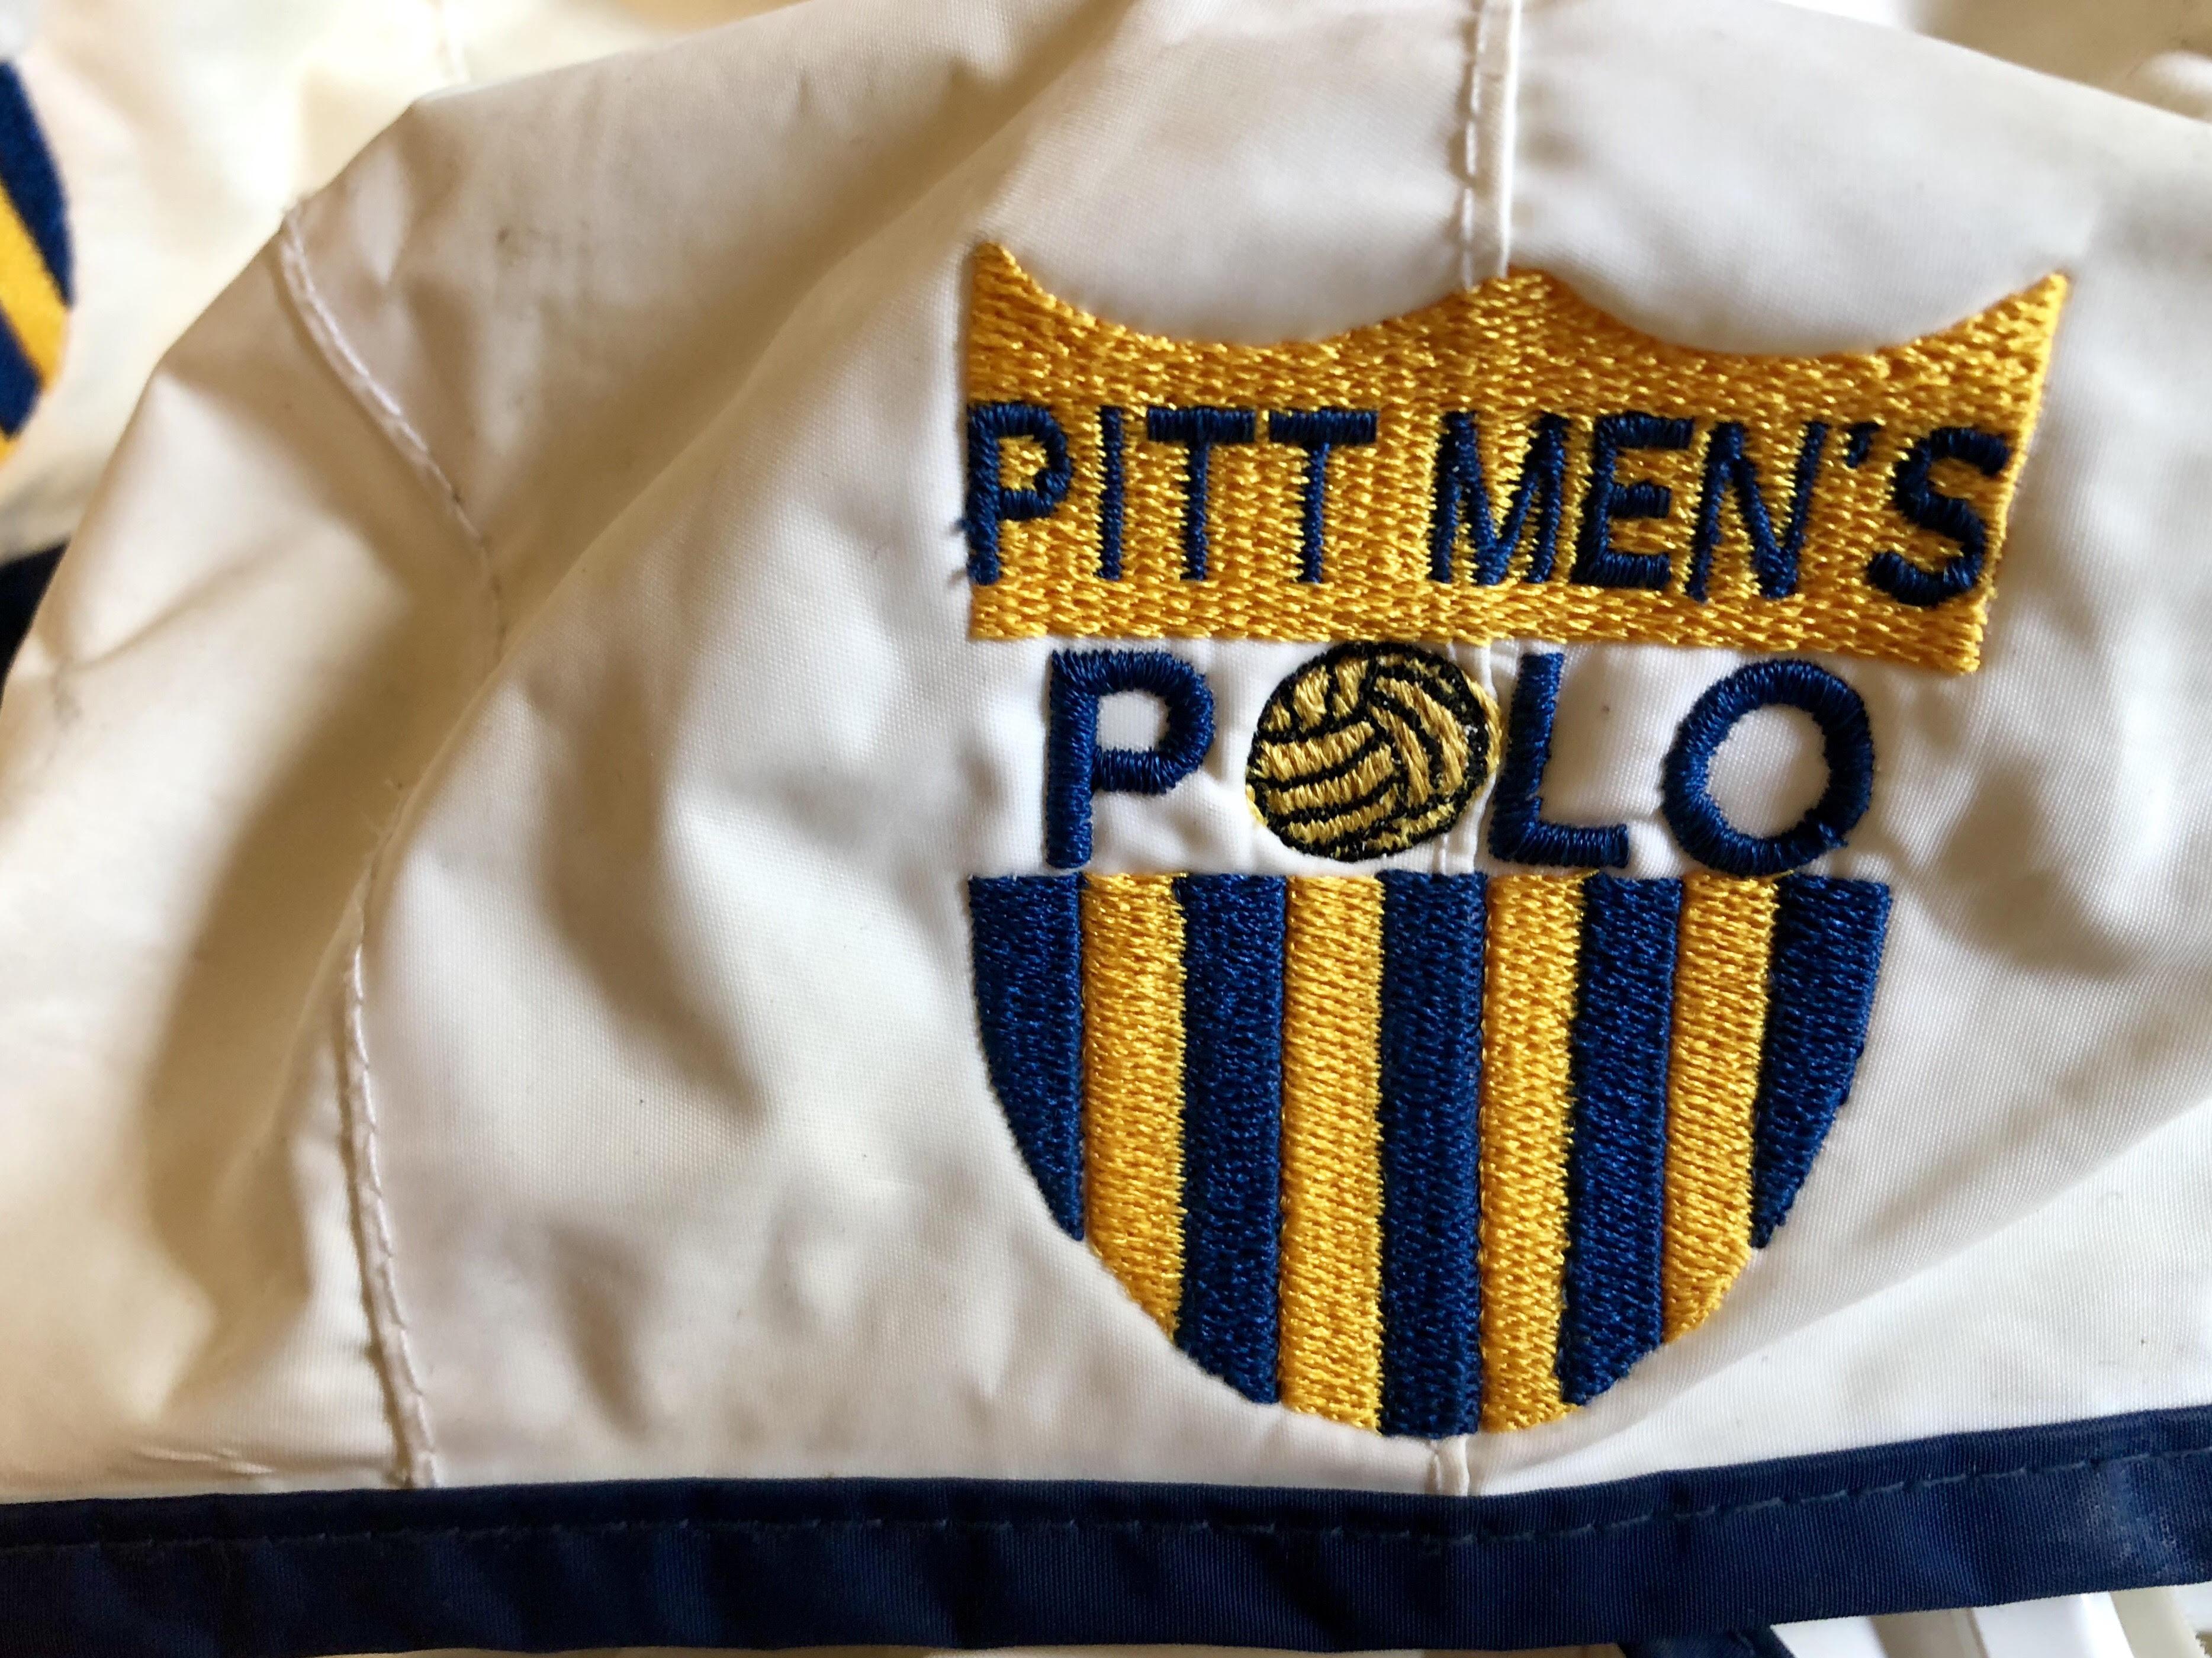 Caps of Pitt